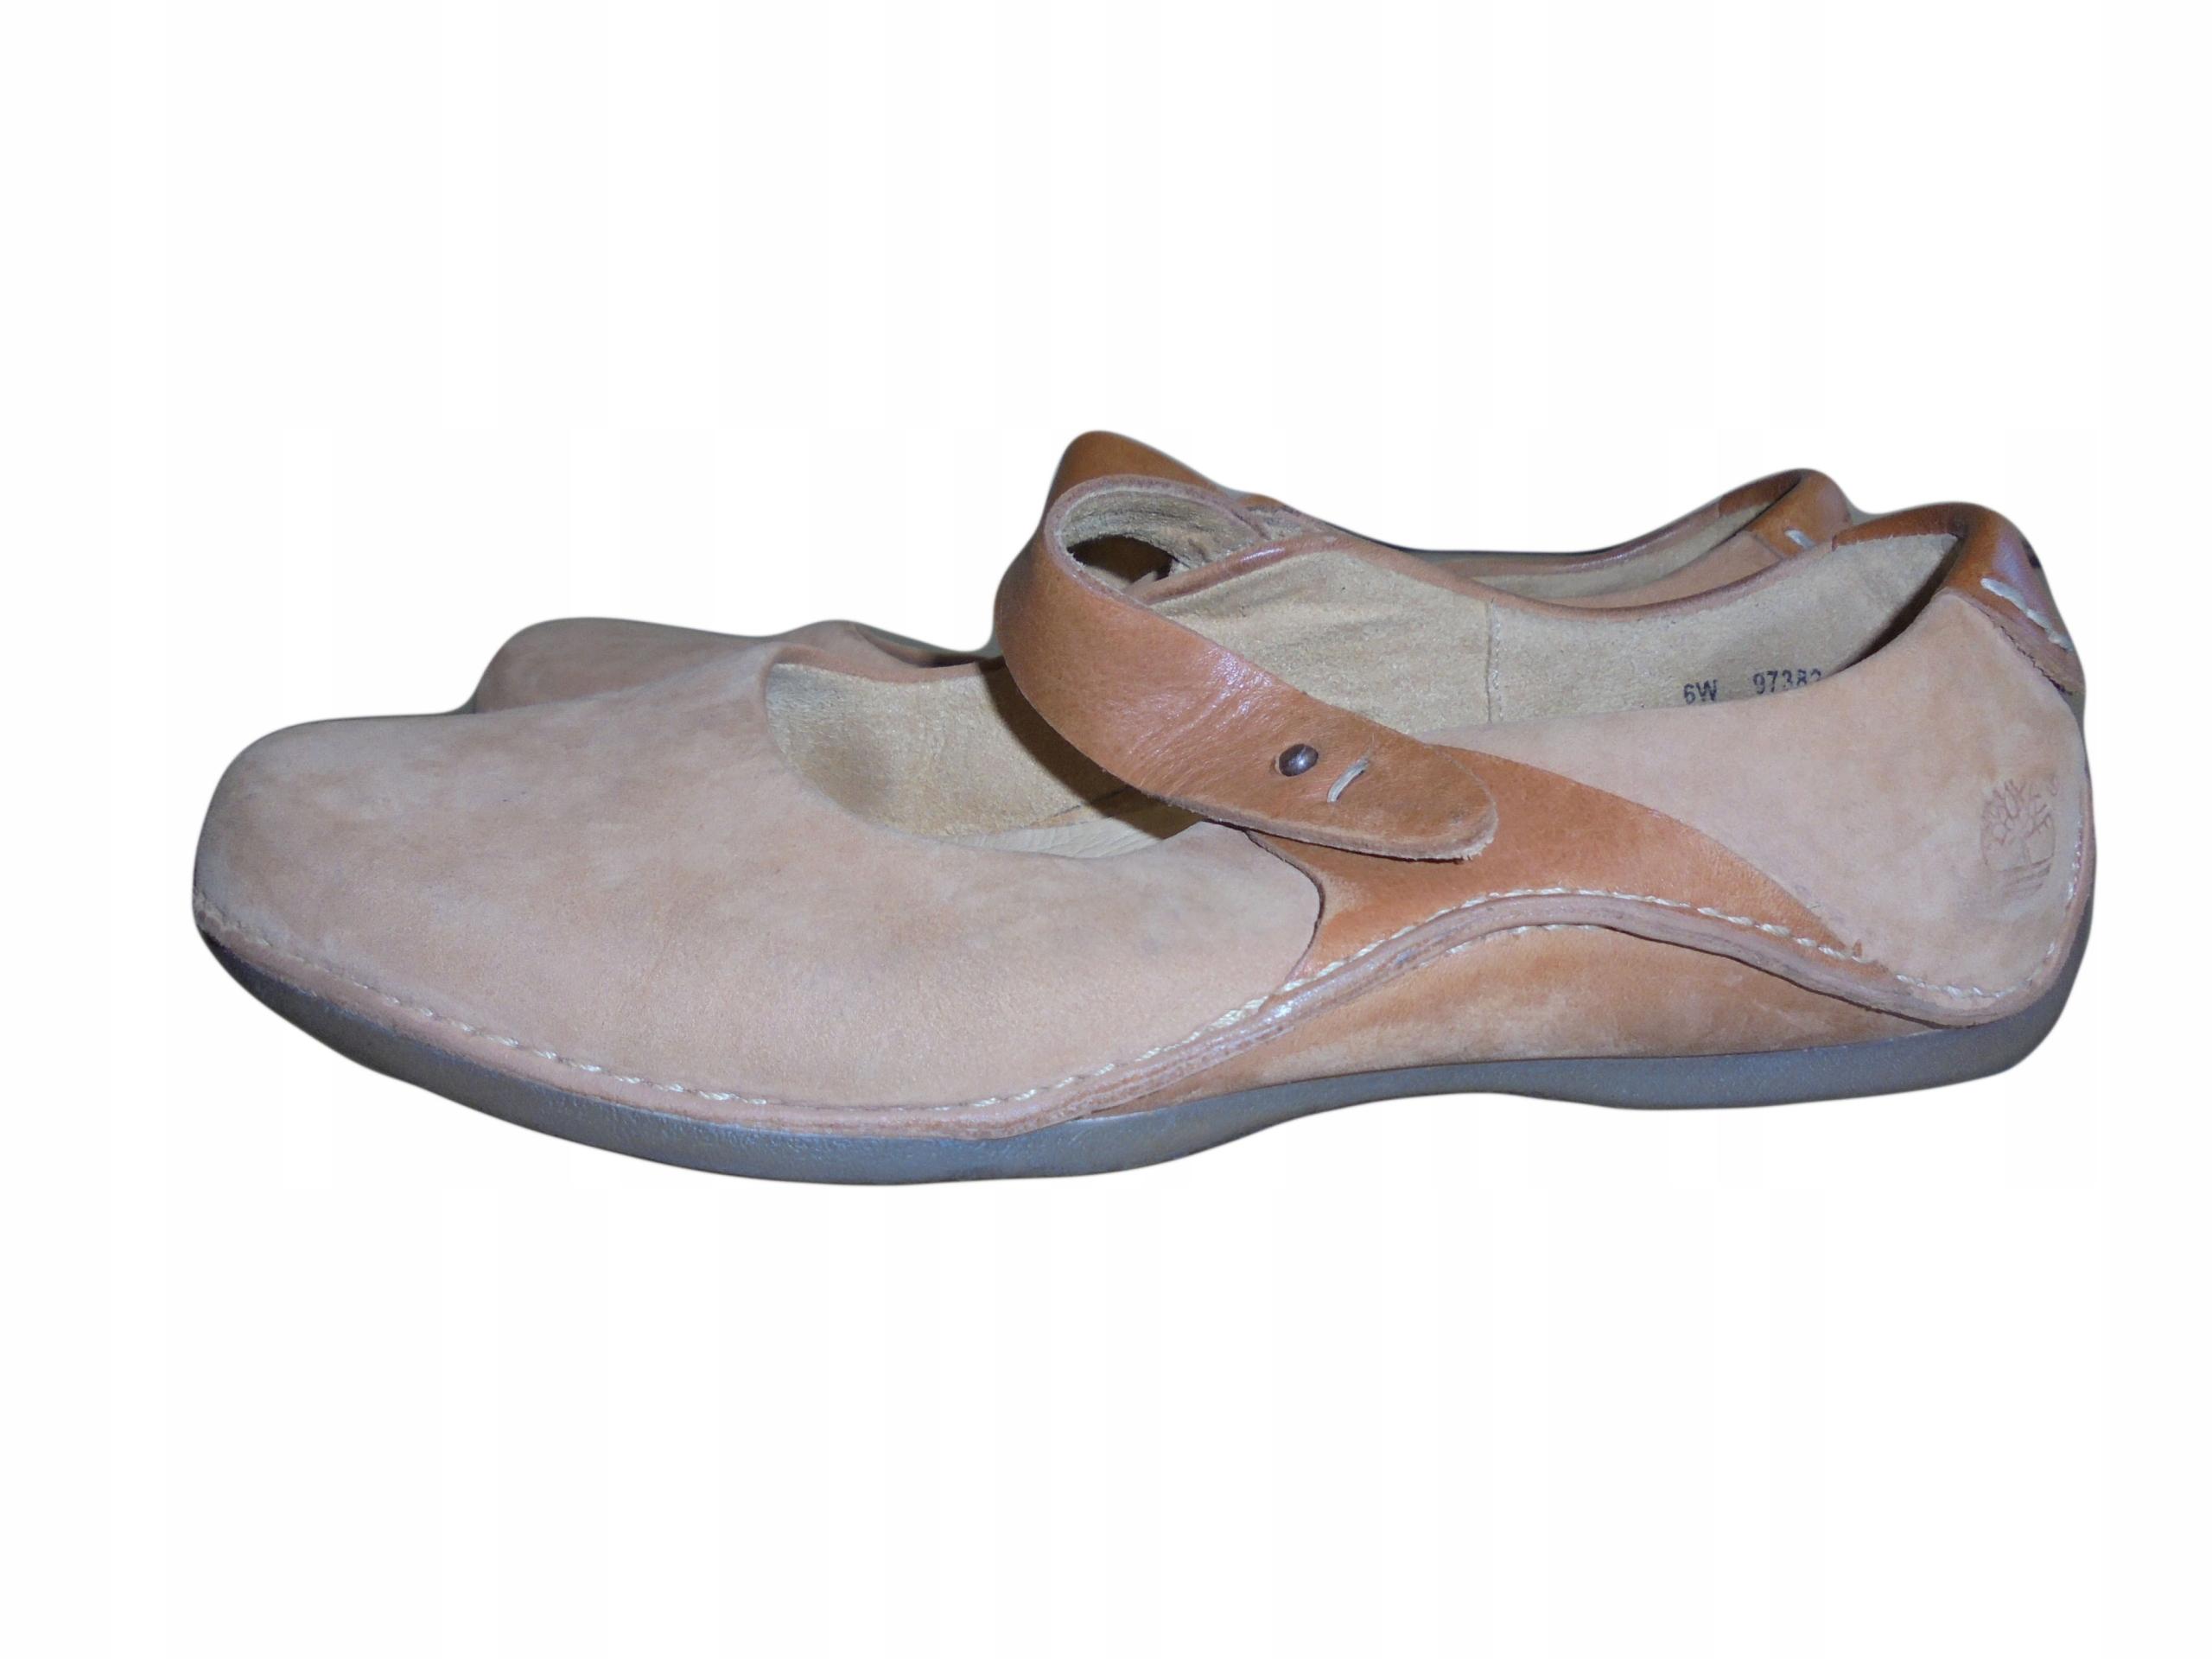 Skórzane balerinki Timberland. Stan idealny. 37,5